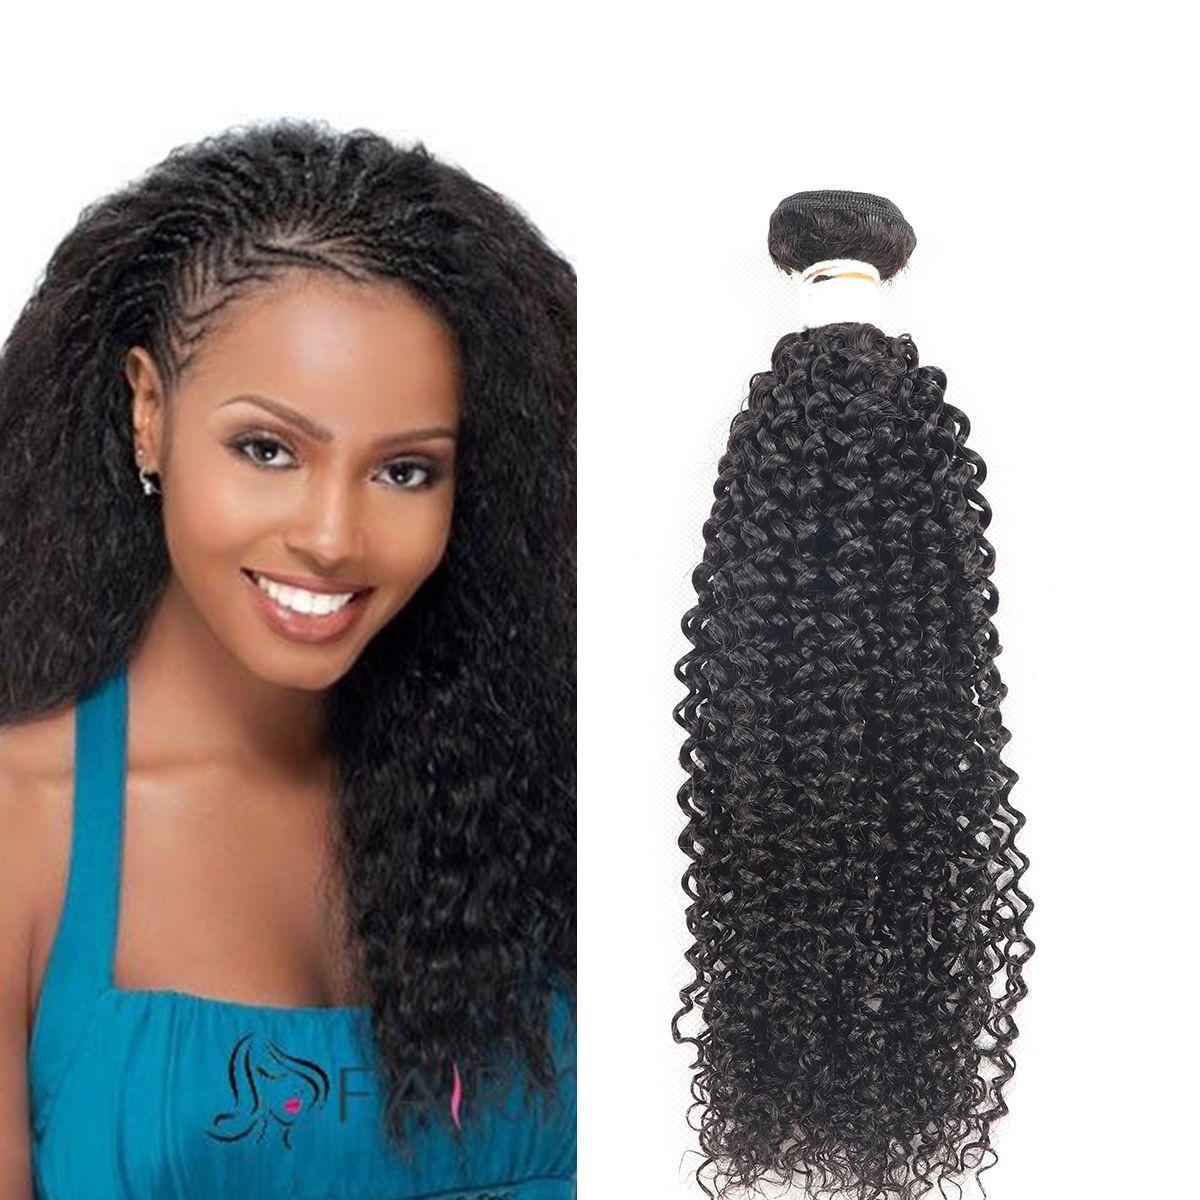 Riverwood Hari 7a Brazilian Virgin Human Hair Kinky Curly Hair